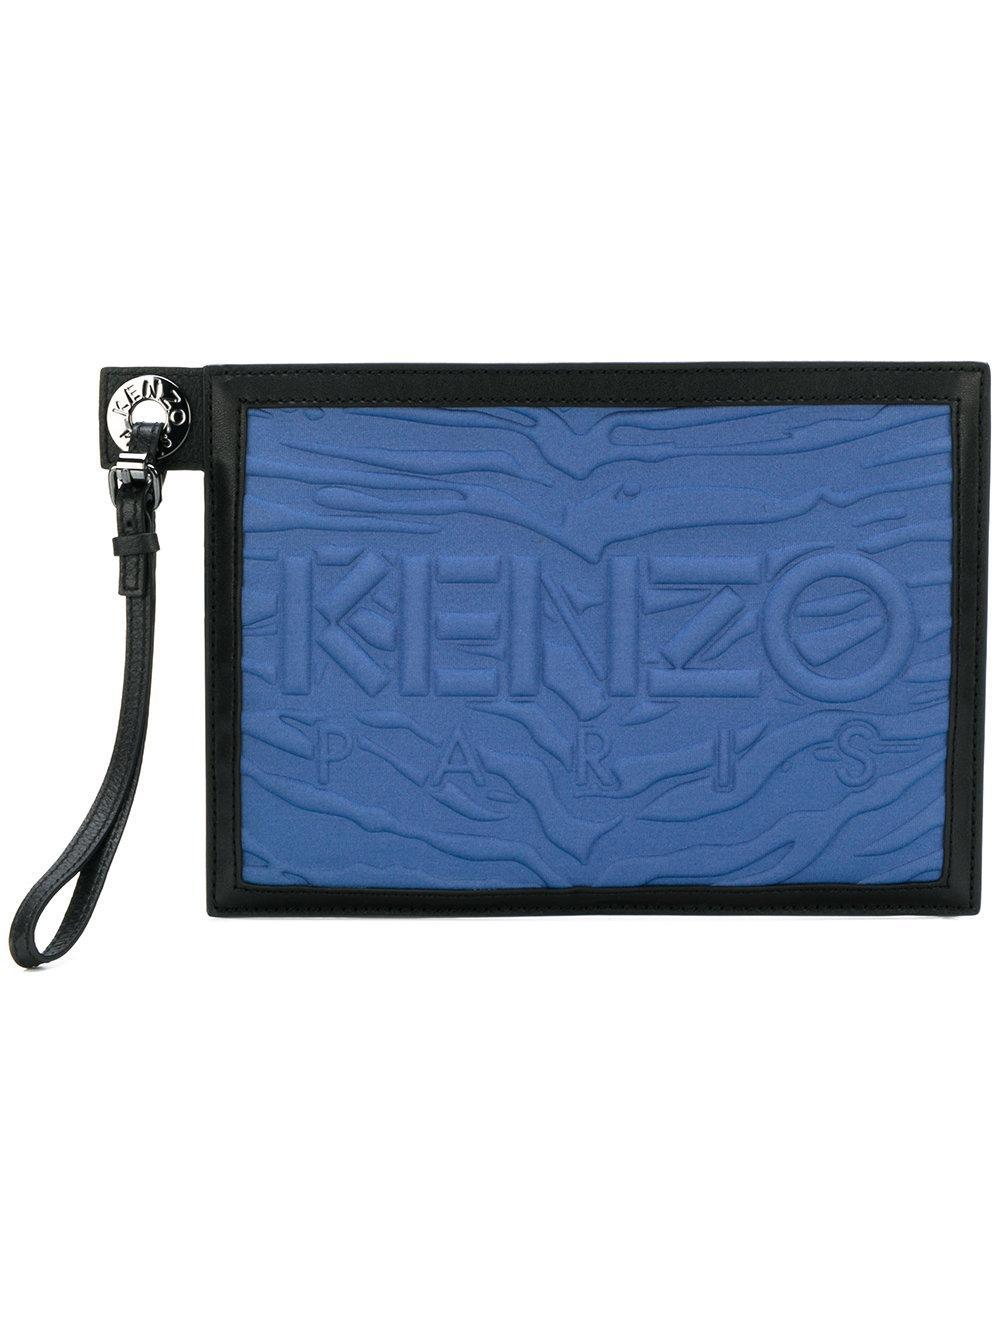 Kenzo Blue